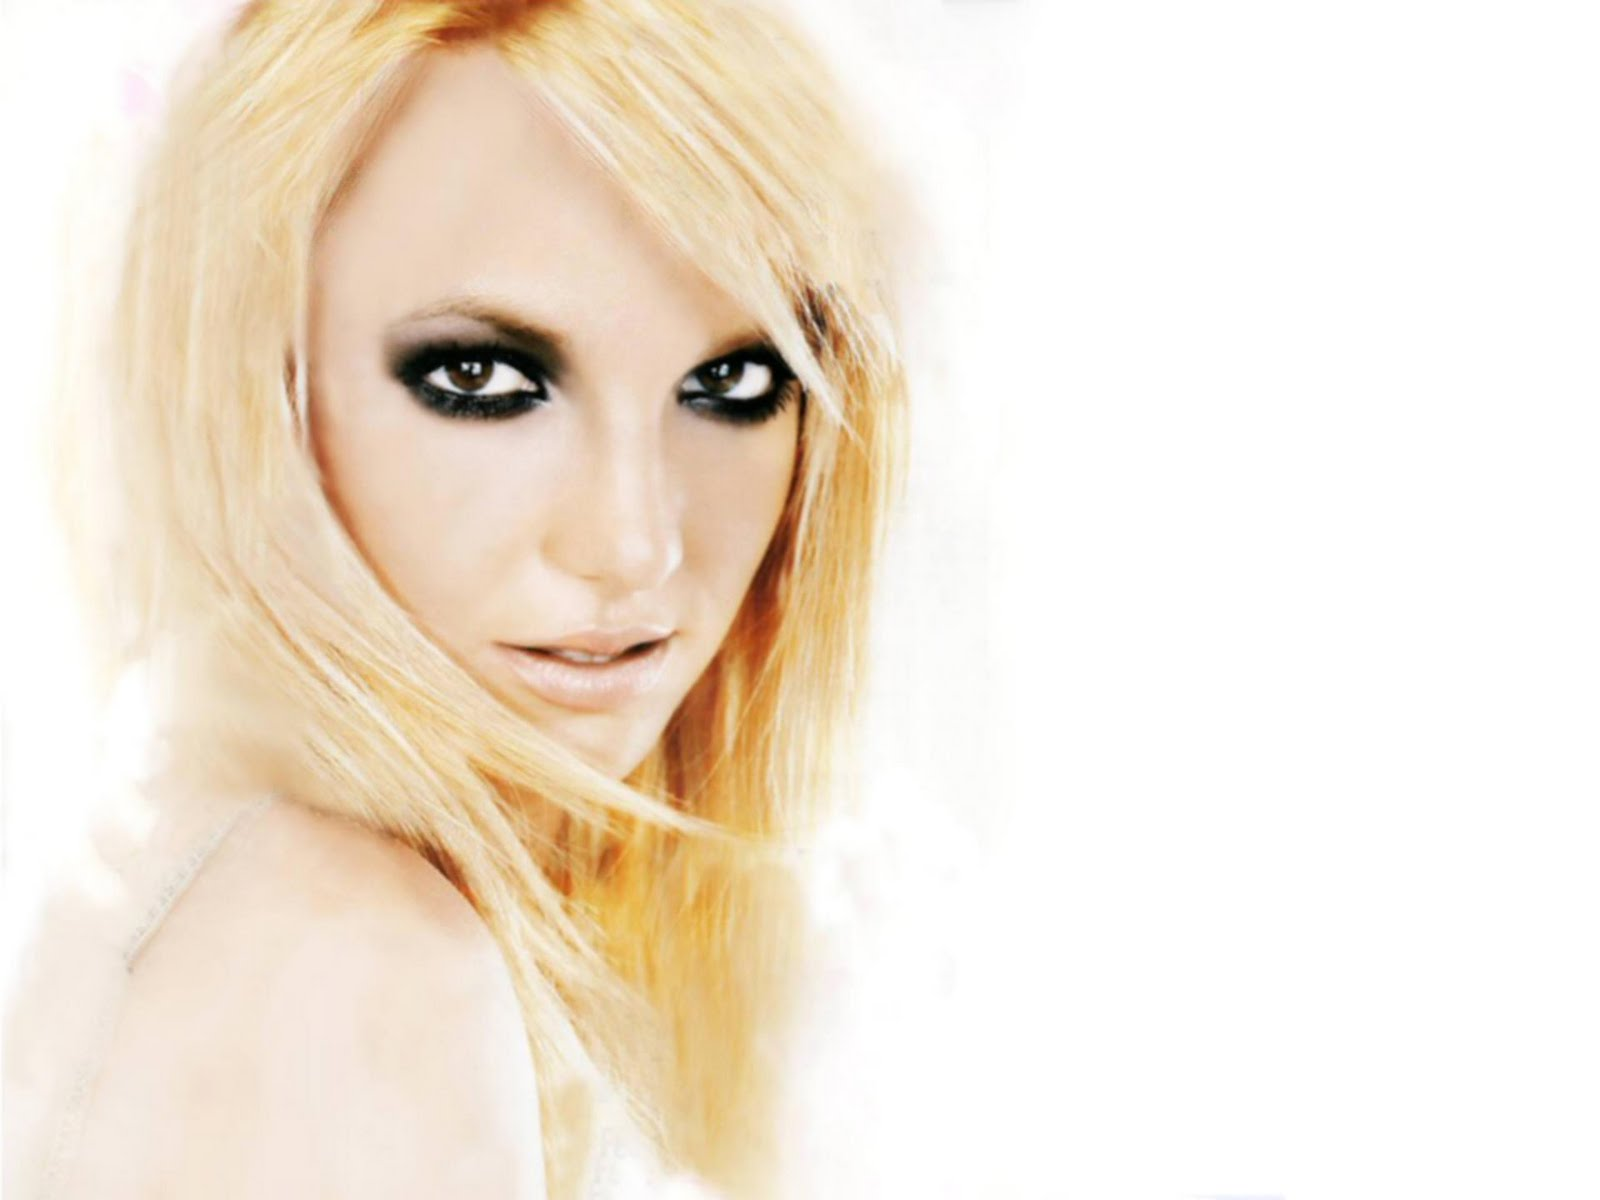 http://4.bp.blogspot.com/-5Dj0wa_404E/TvNYSGvq_CI/AAAAAAAAAgc/nm3tfV01XY0/s1600/gorgeous_britney_spears_wallpaper-1600x1200-081.jpg